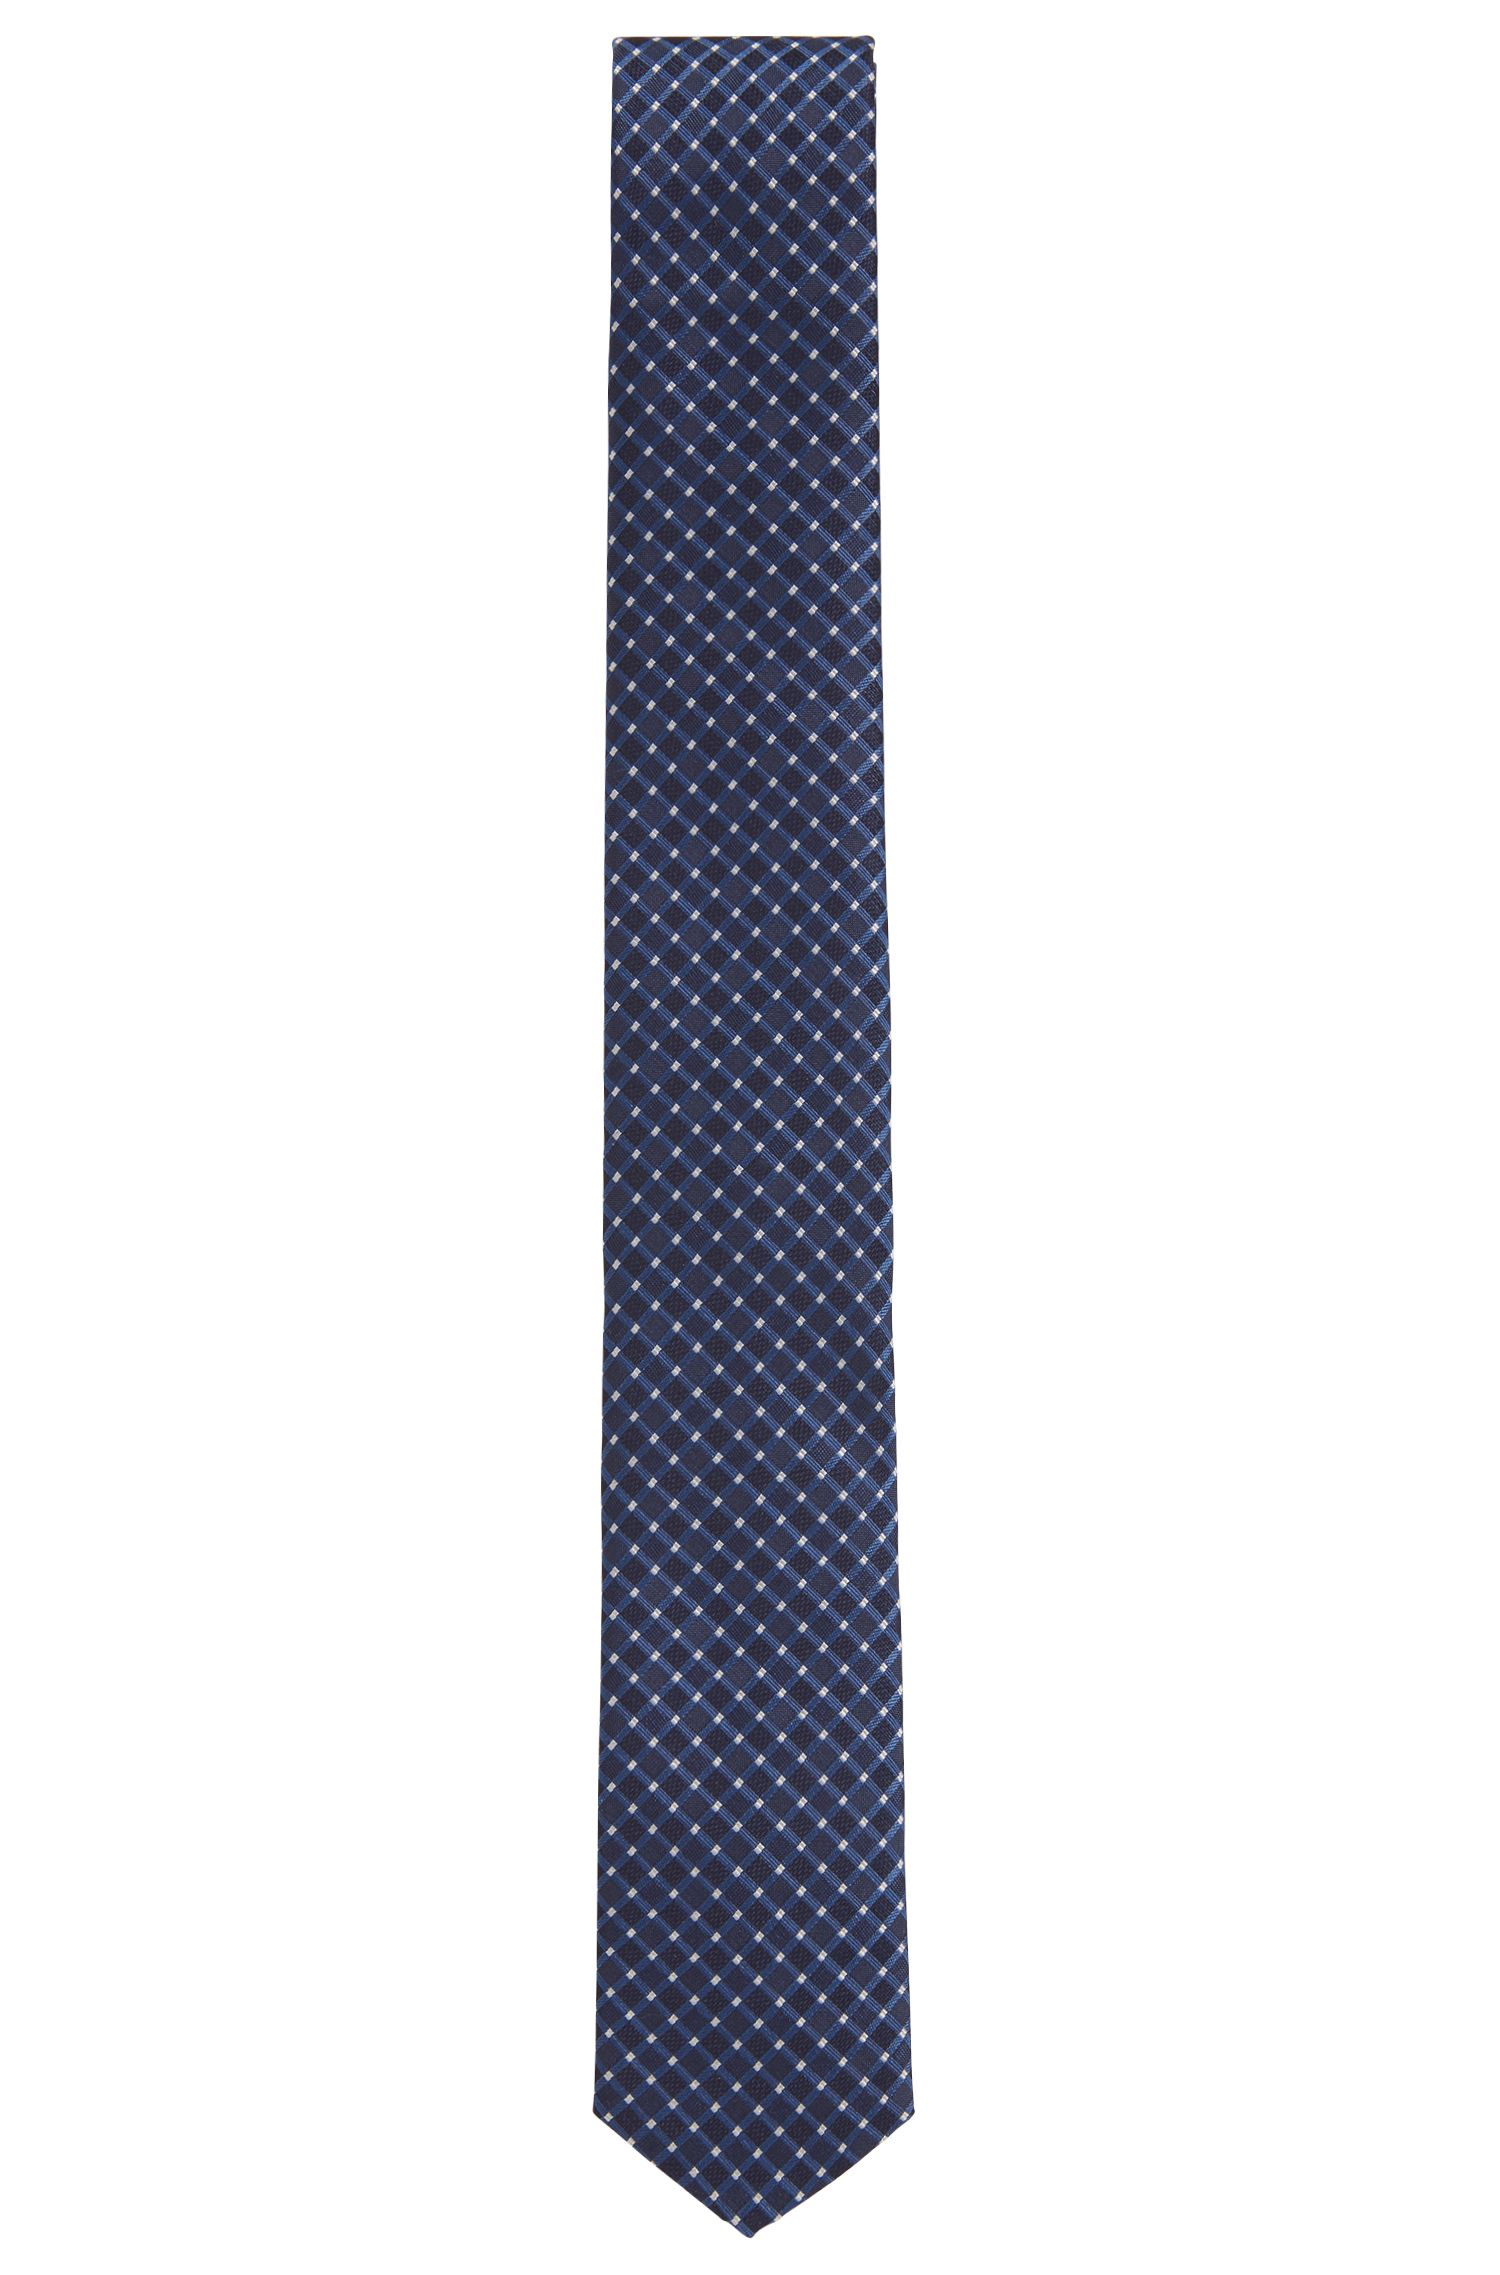 Slimline patterned tie in water-repellent silk jacquard